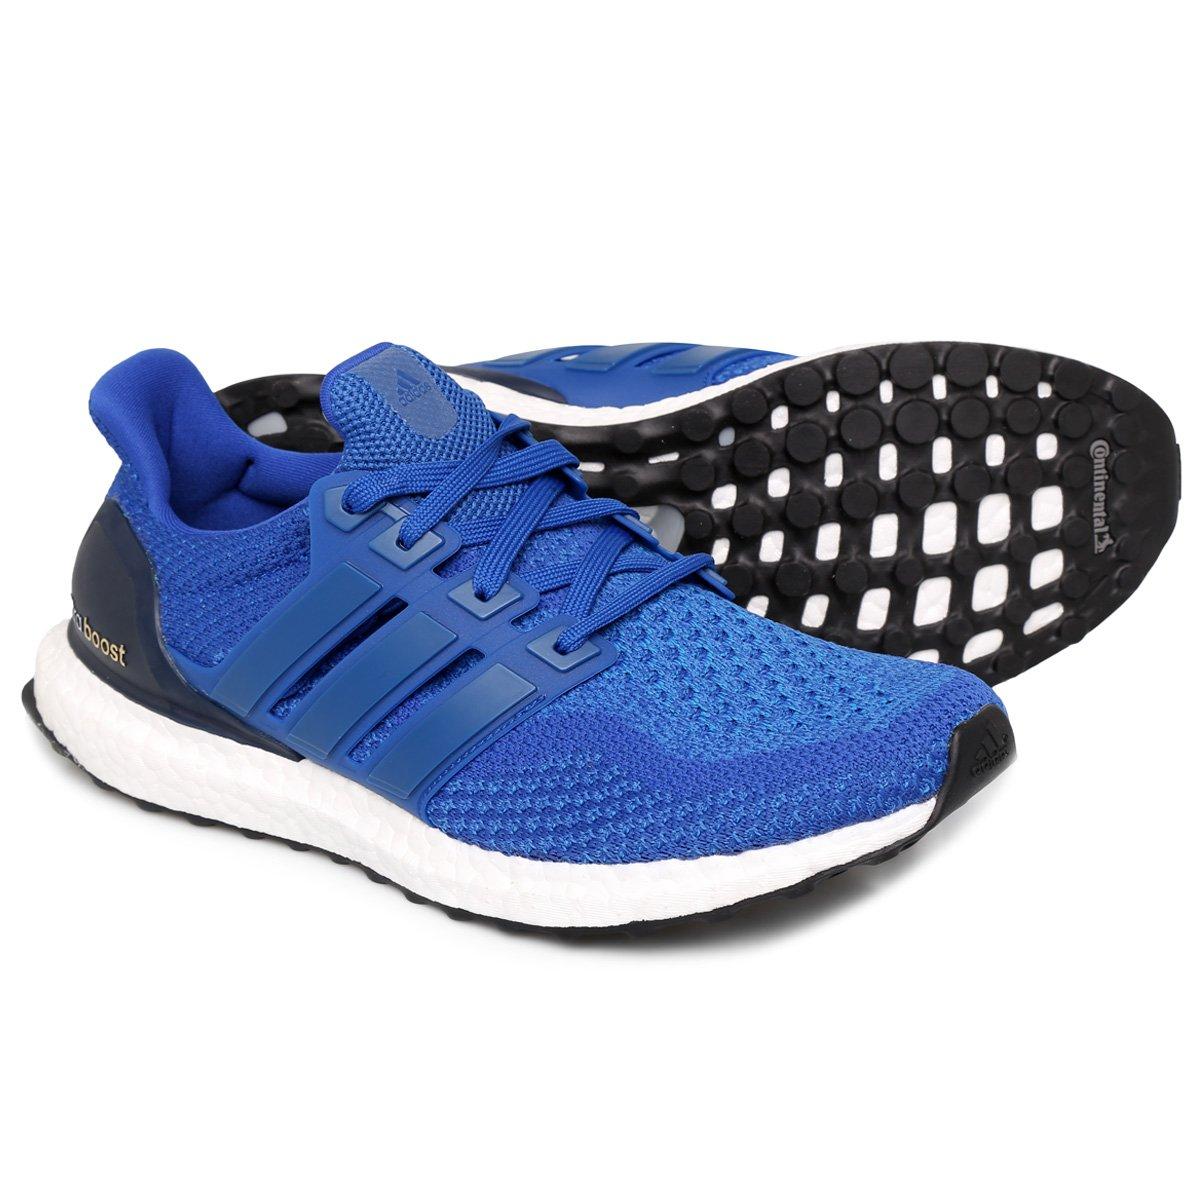 7c667c6a3b4de Tênis Adidas Ultra Boost Masculino - Compre Agora